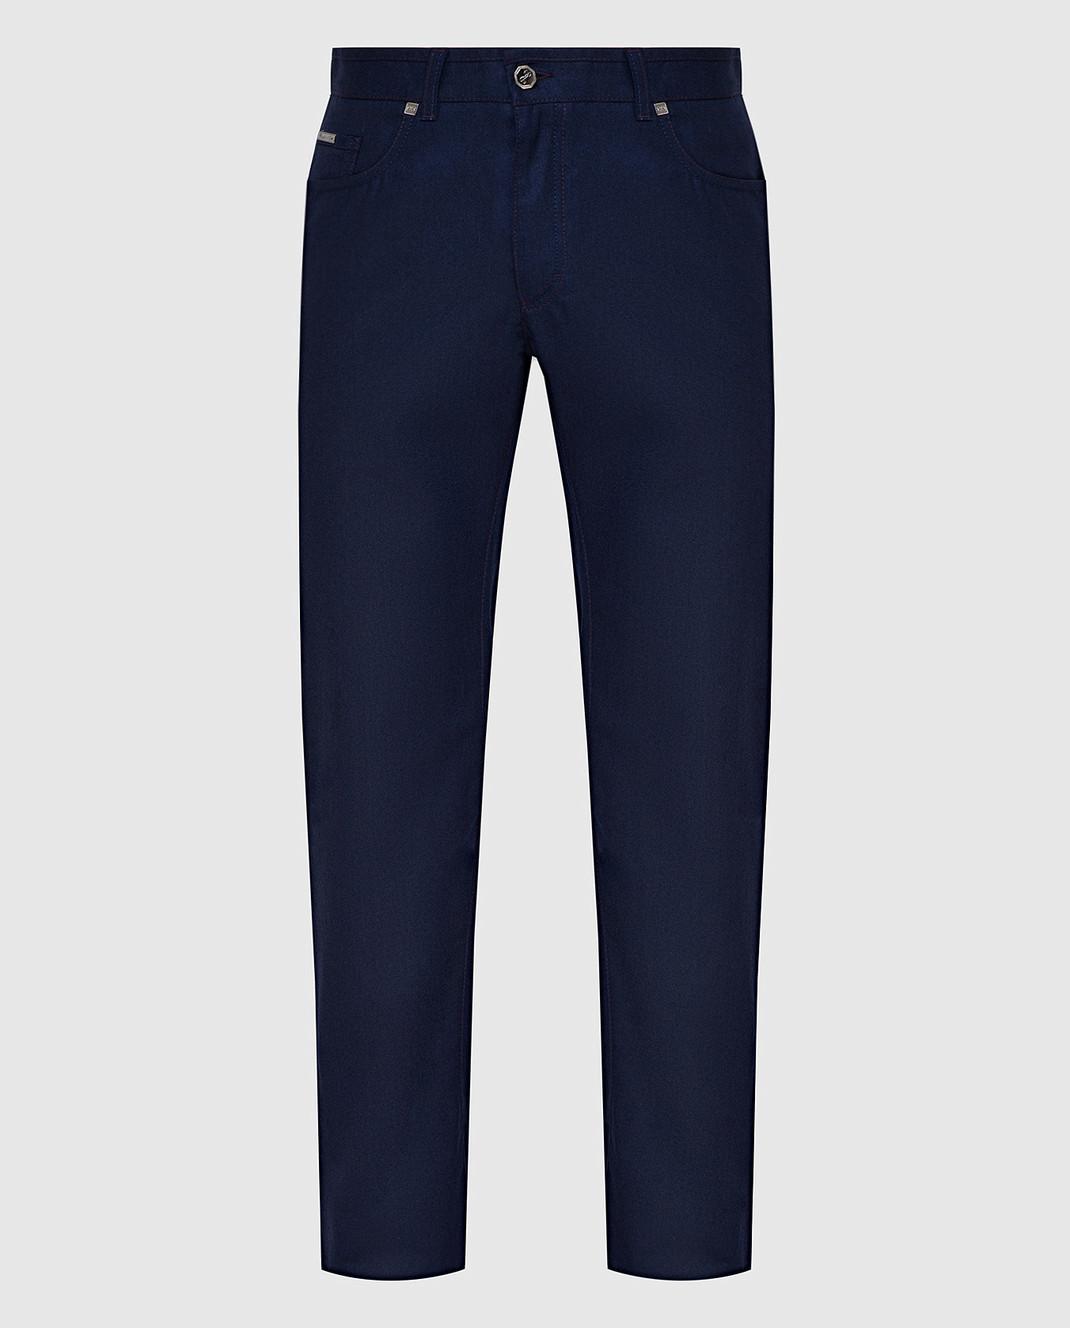 Castello d'Oro Темно-синие брюки из шерсти изображение 1